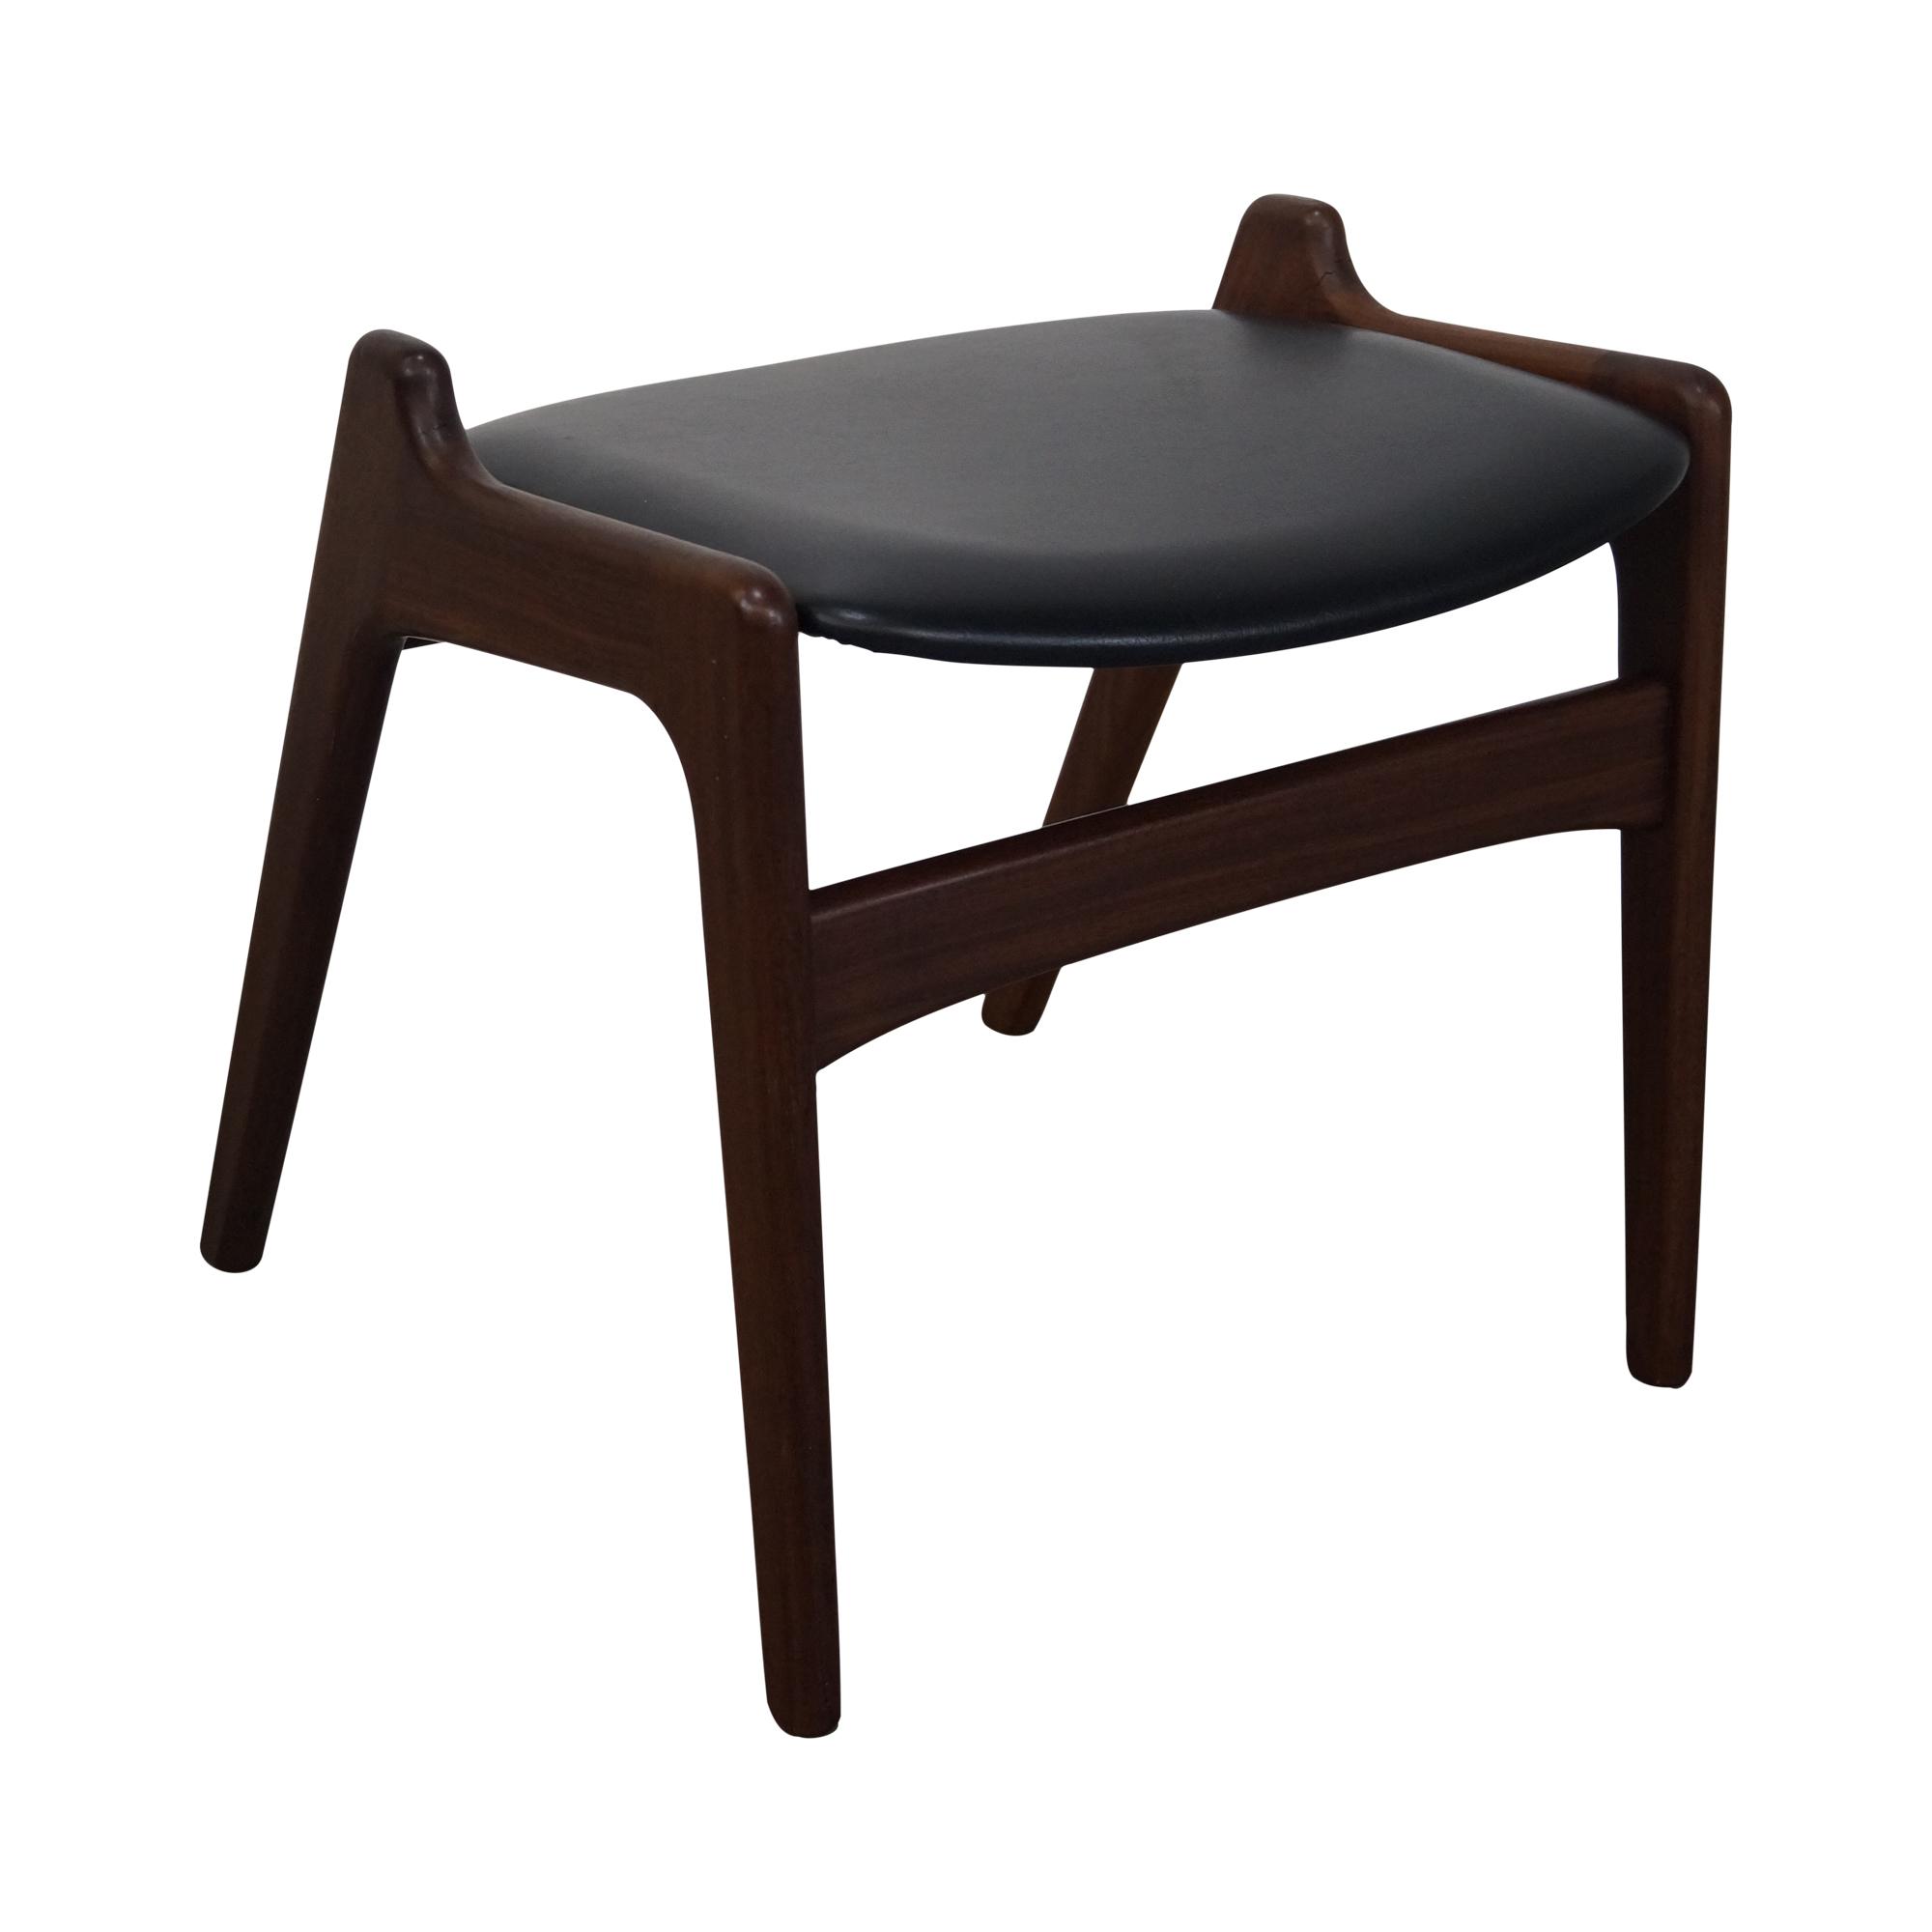 Danish Modern Teak Ottoman Bench Backless Chair For Sale  sc 1 st  Chairish & Danish Modern Teak Ottoman Bench Backless Chair | Chairish